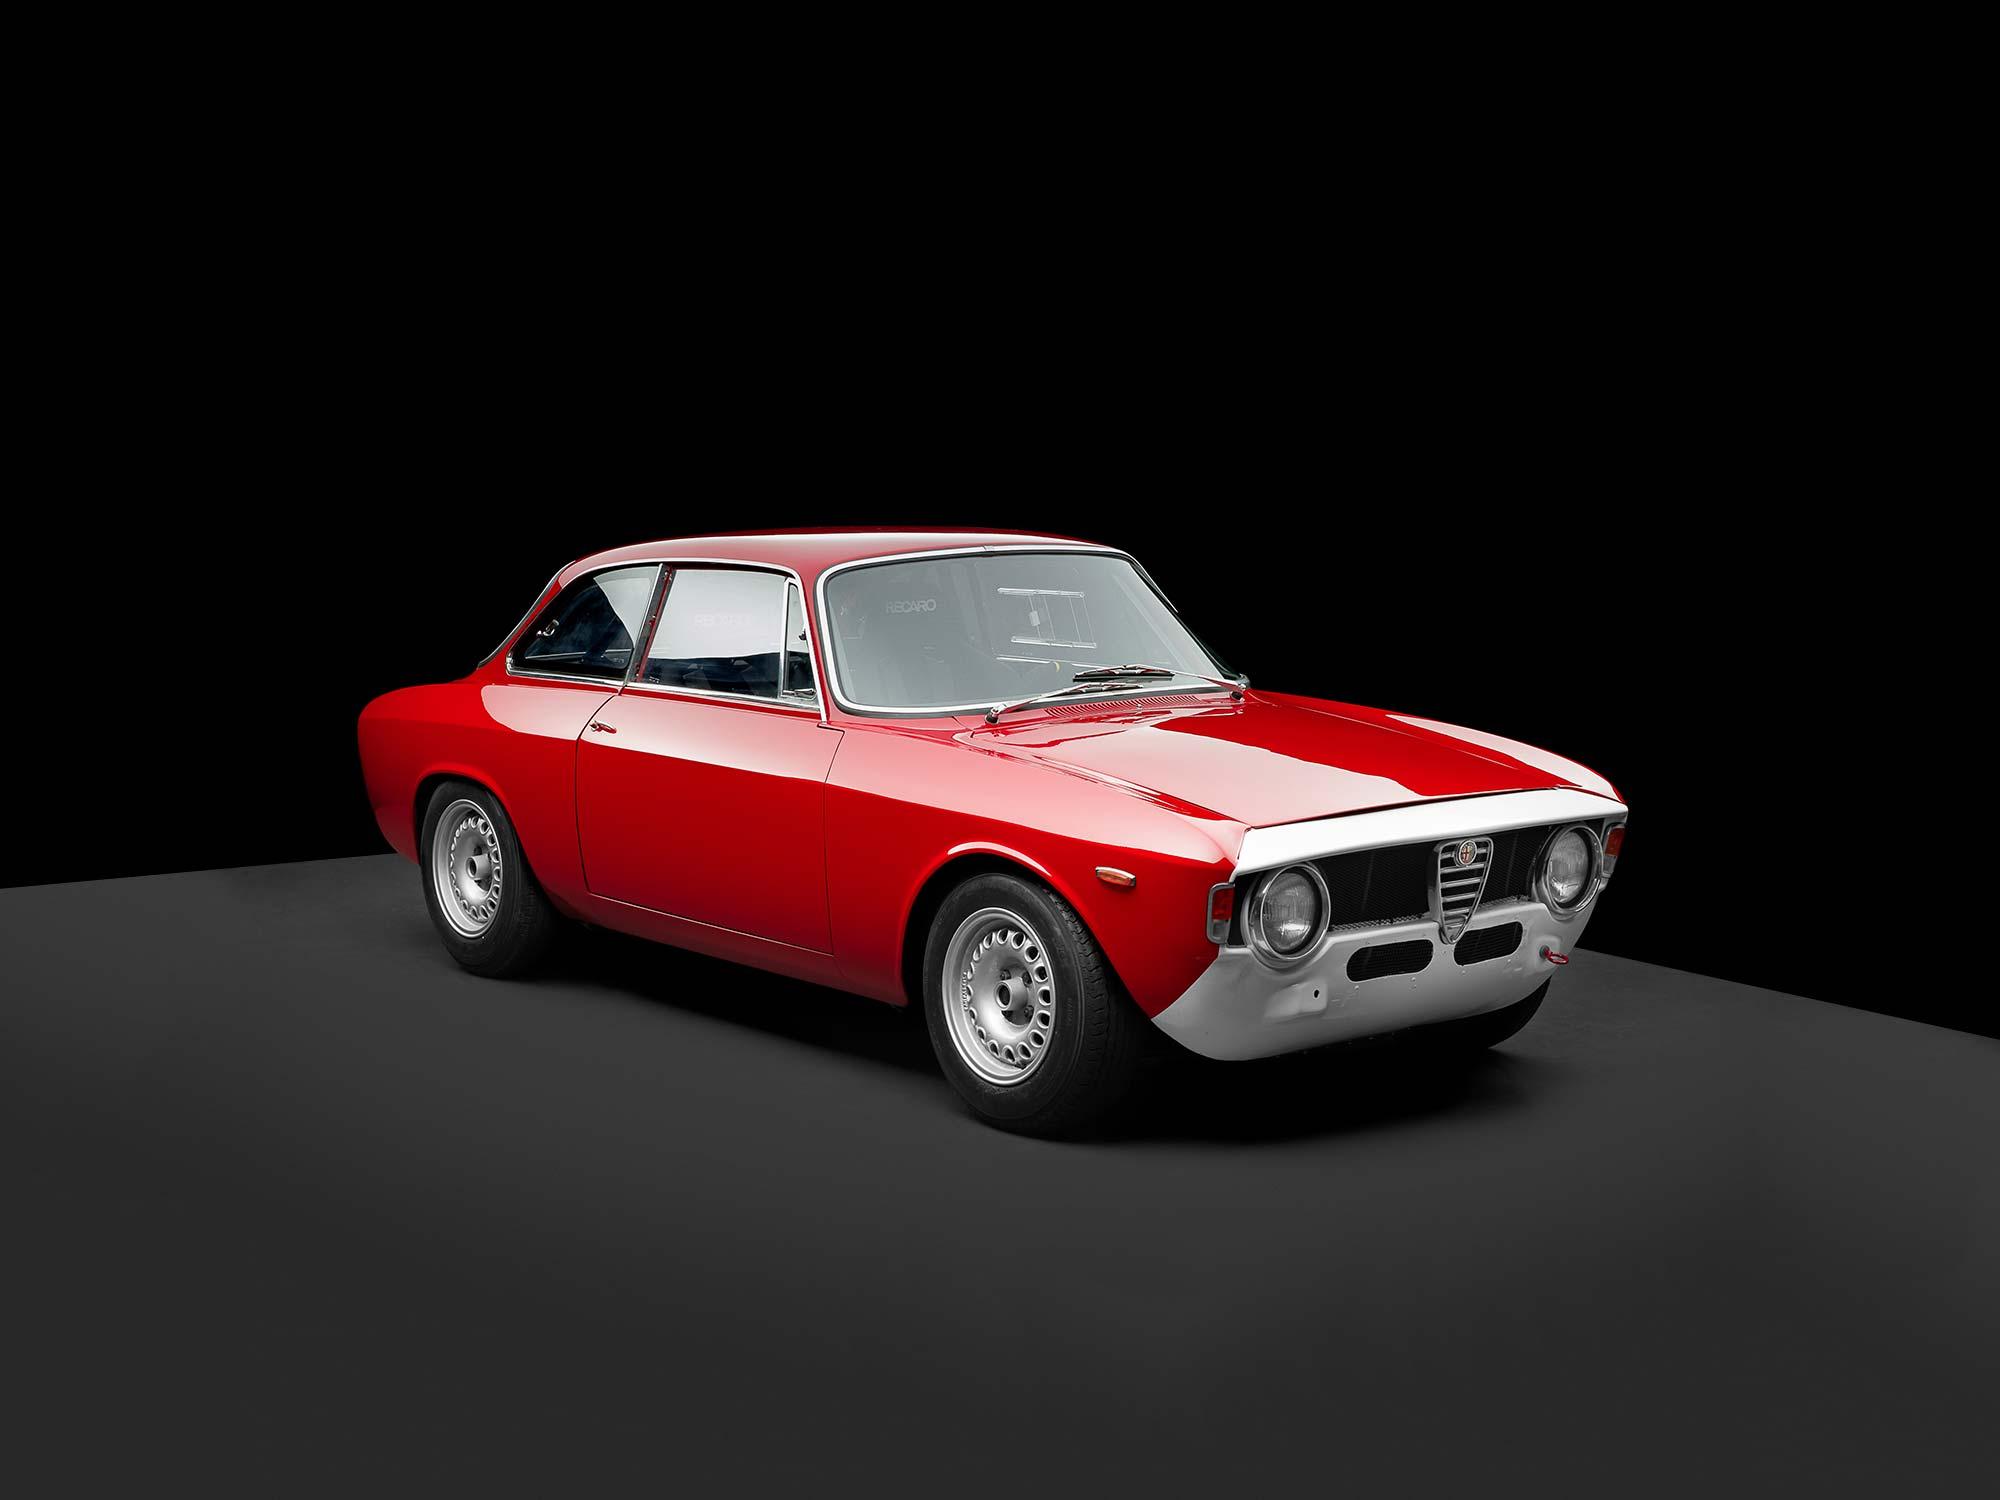 1965 alfa romeo gta 1600 gta classic driver market. Black Bedroom Furniture Sets. Home Design Ideas